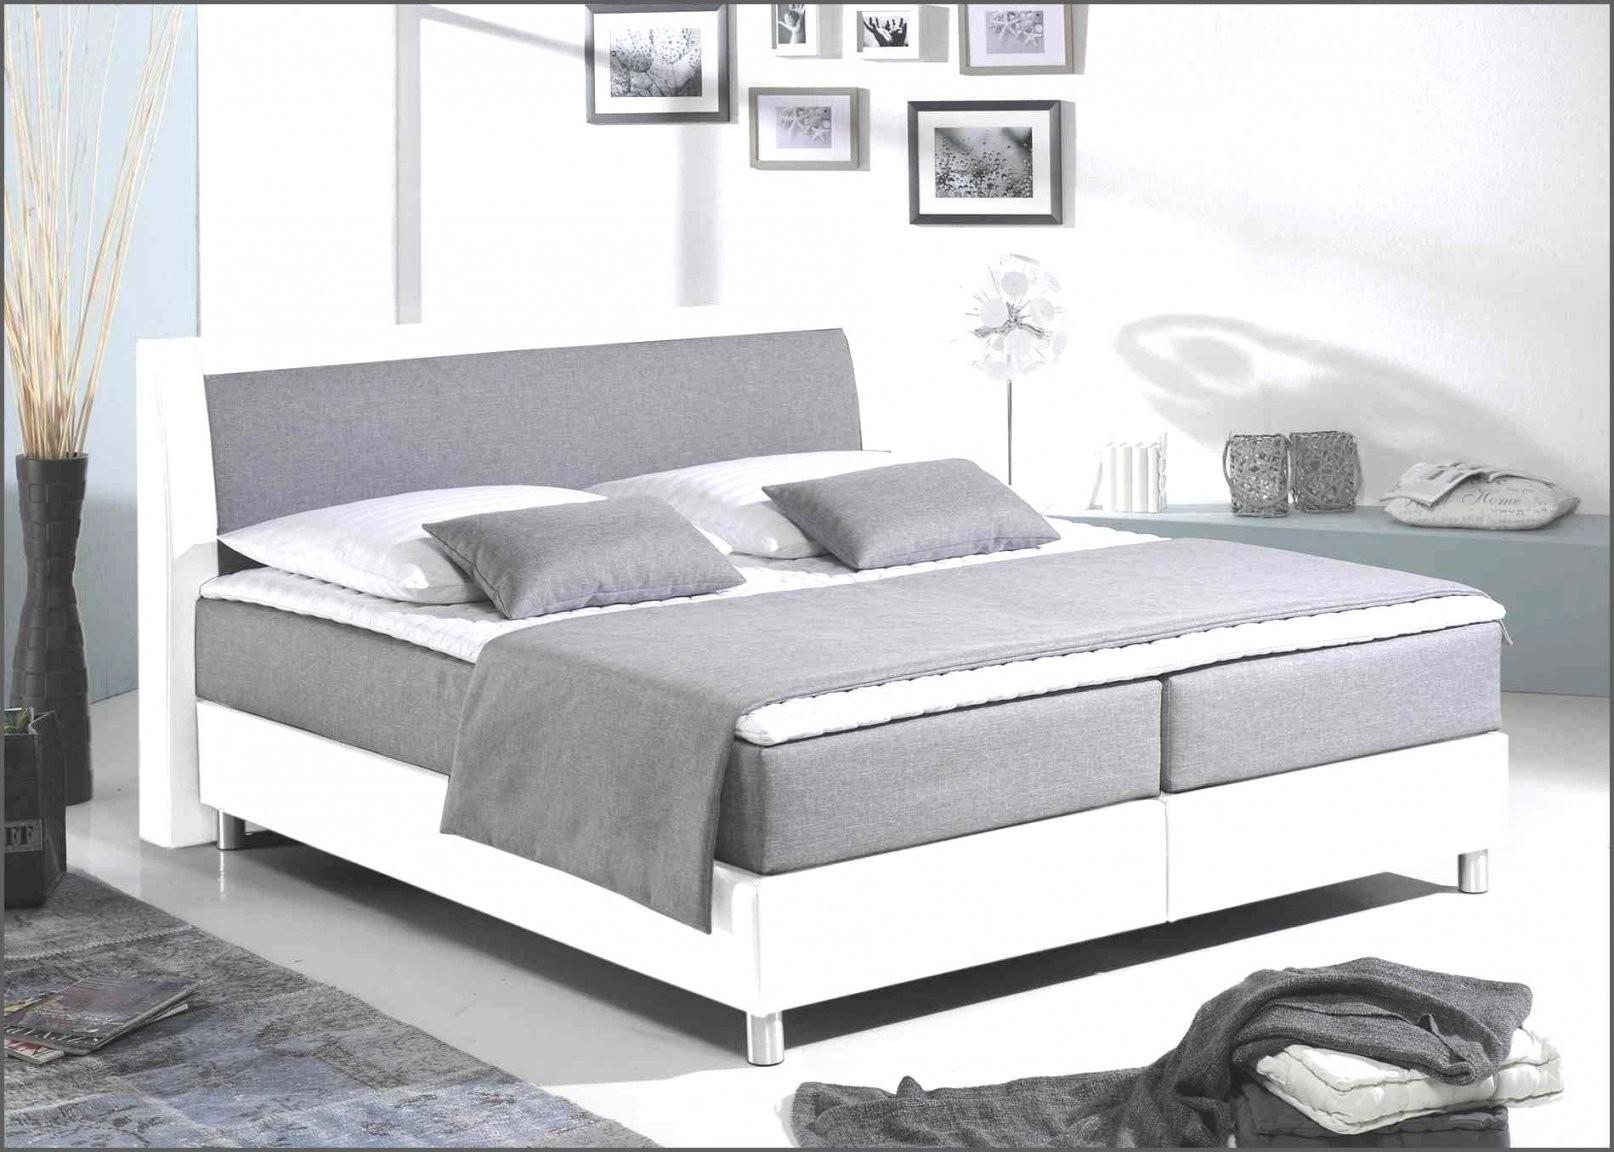 Bett Mit Led Beleuchtung 180×200 Inspirierend Cool Bett Weiß Leder von Opium Bett 160X200 Bild